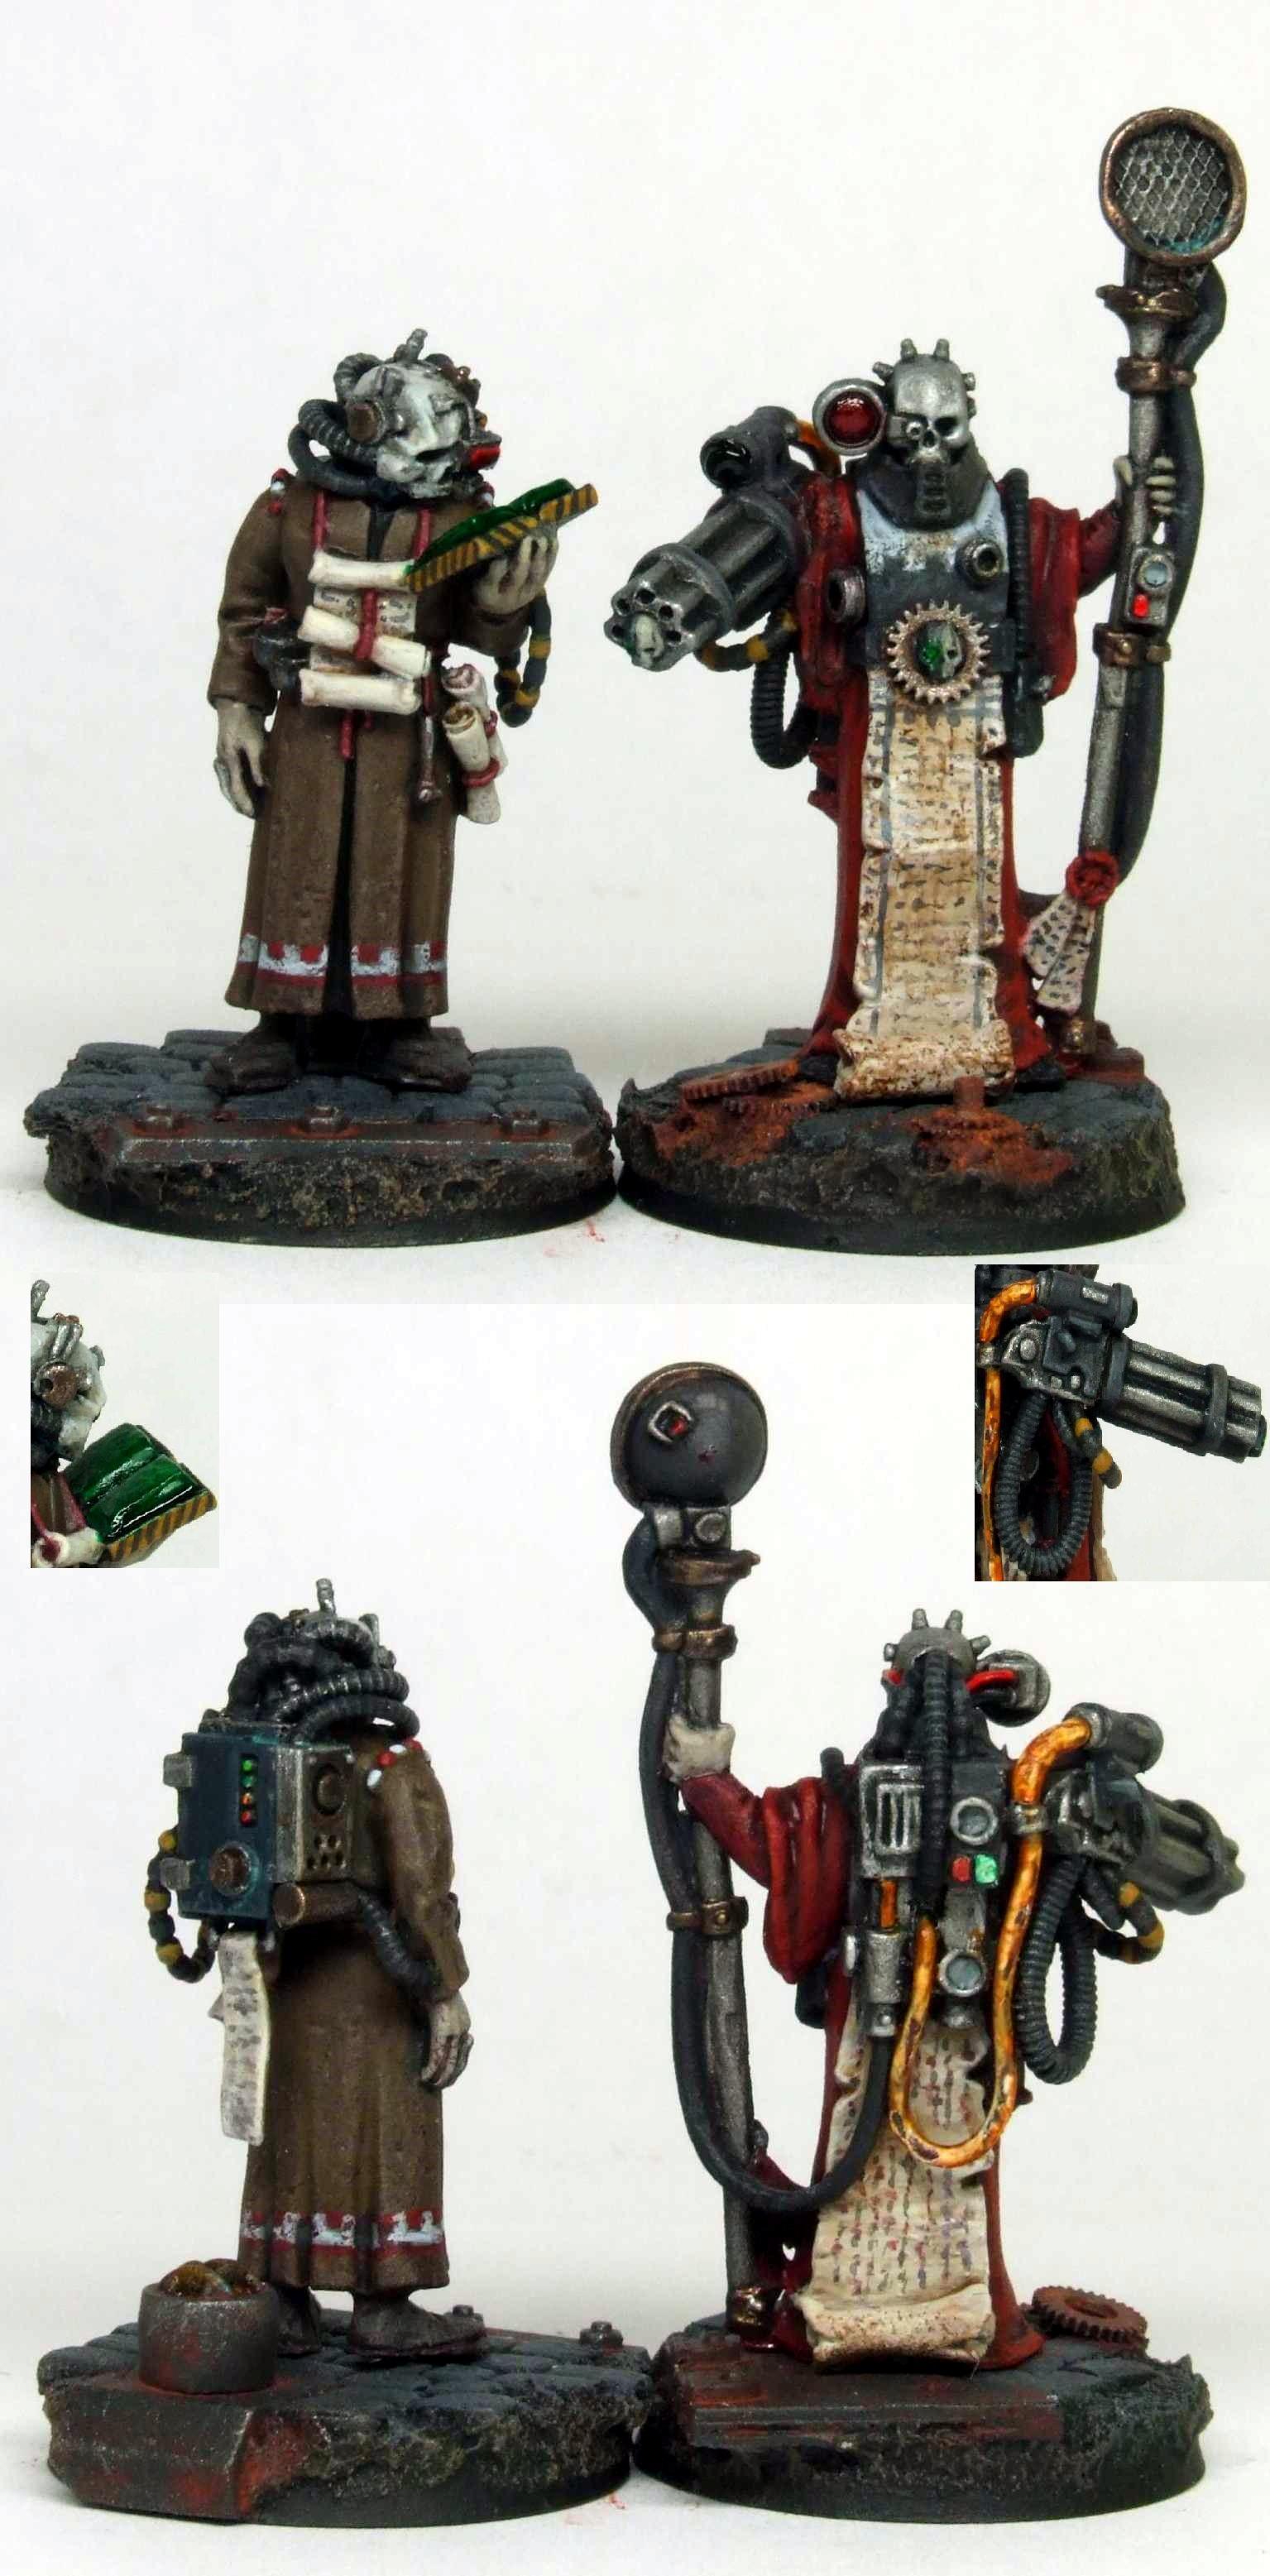 Adeptus Mechanicus, Inq28, Inquisitor, Mechanicus, Scribe, Shrine, Tech Priest